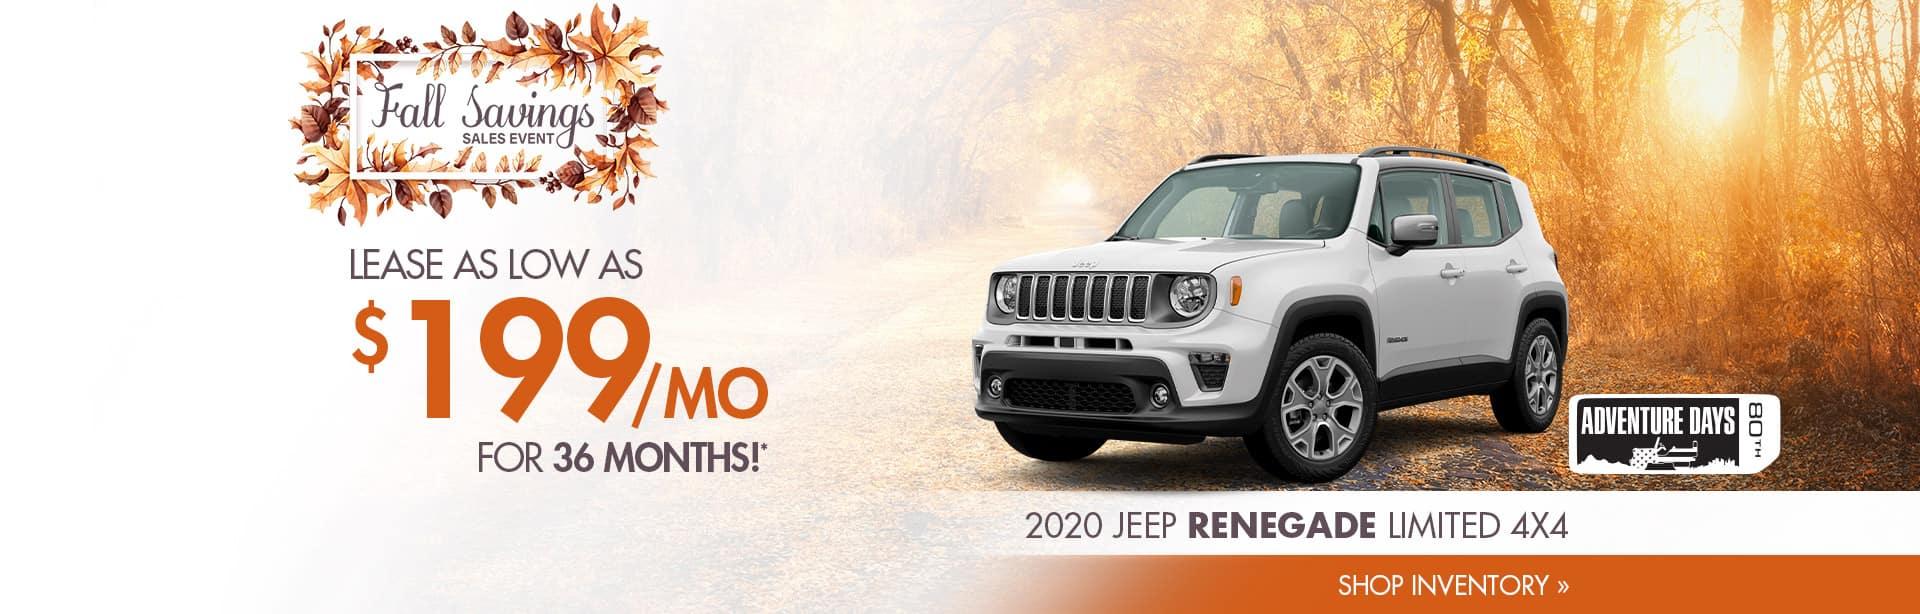 Big Savings on a New Jeep Renegade near Rockville, Indiana